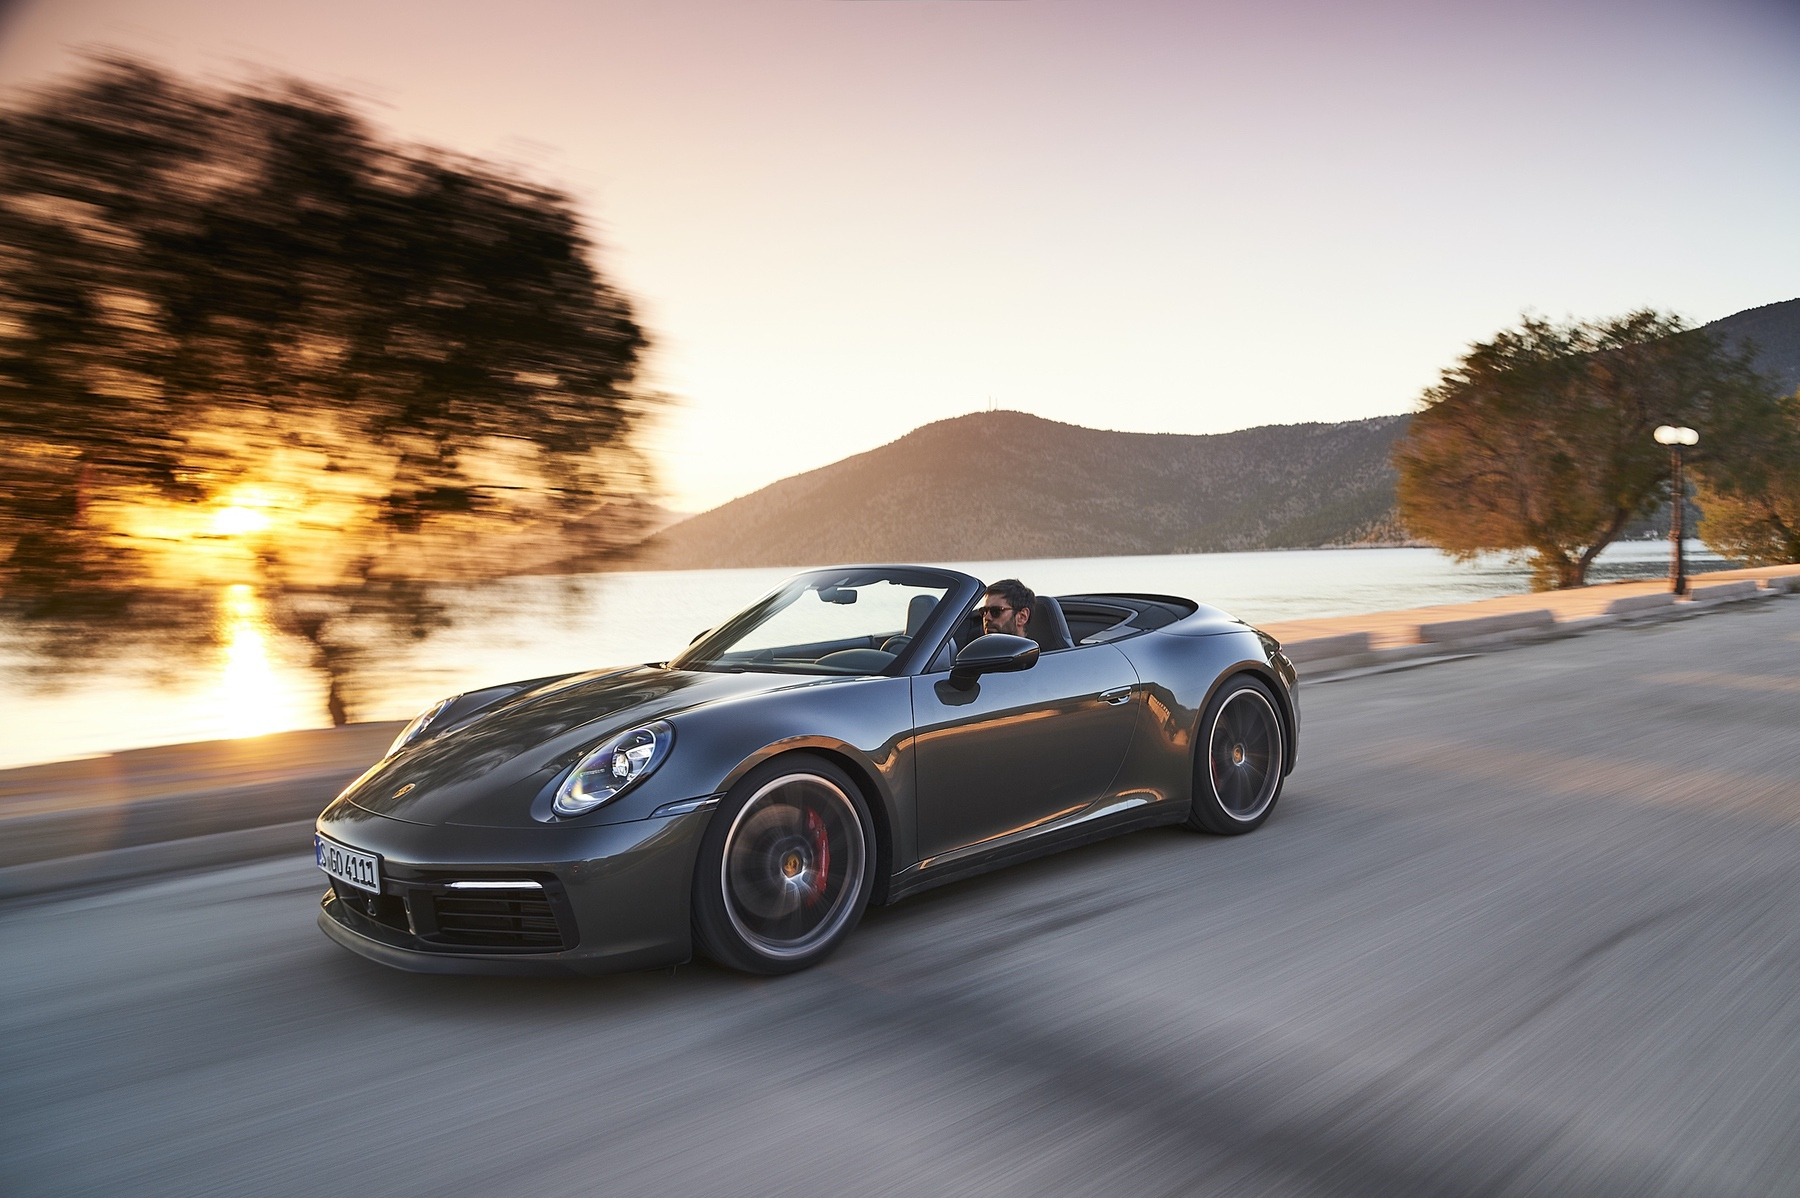 Test_Drive_Porsche_911_Athens_0130